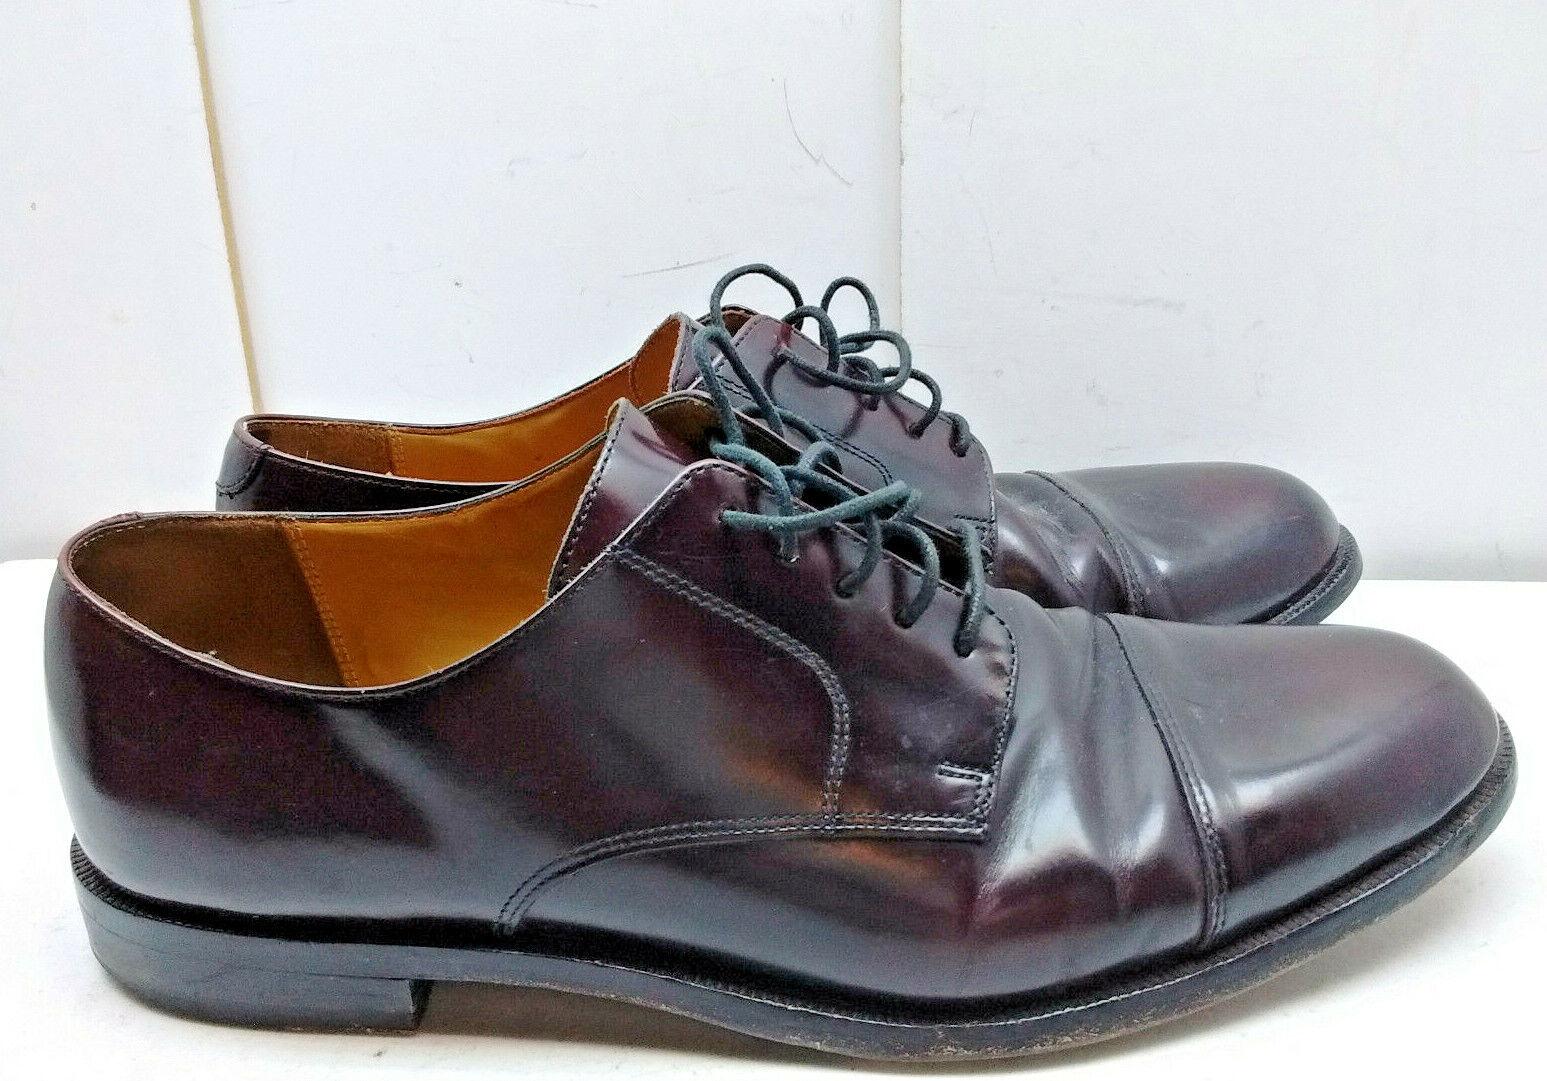 Cole Haan Bourgogne Cuir Oxford Cap Toe à Lacets Robe Formelle Chaussures Hommes 11.5 m